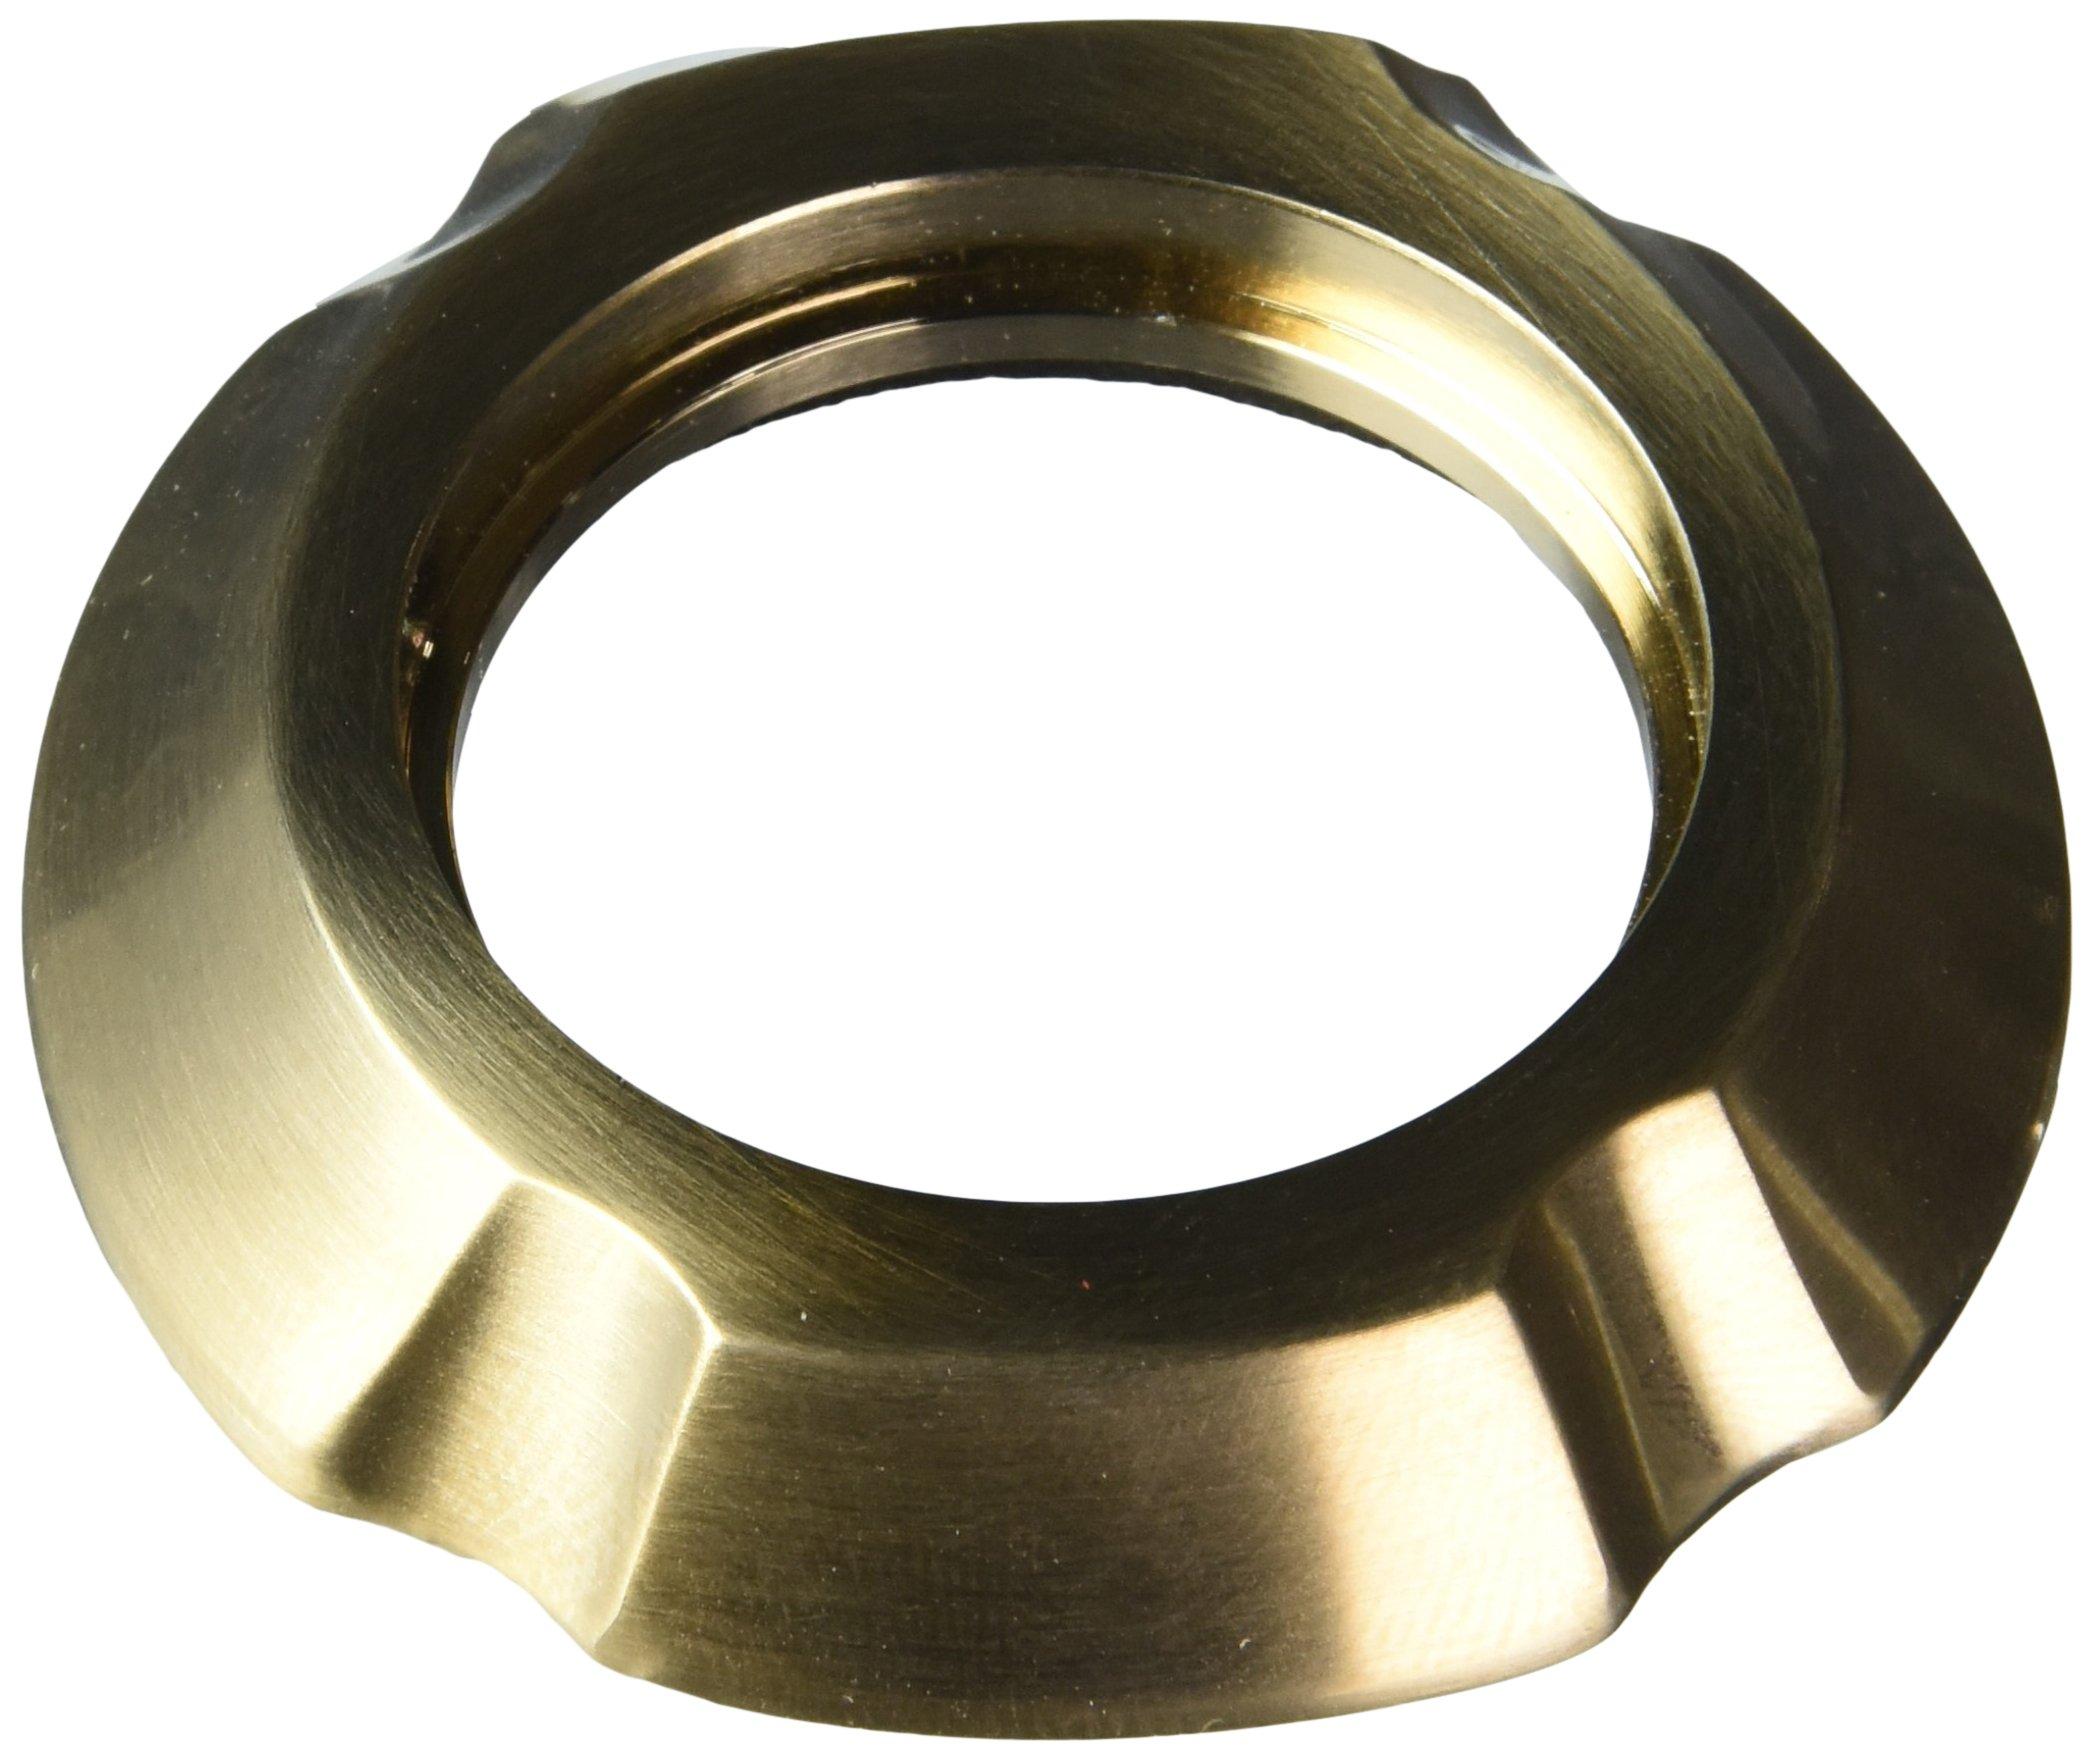 Delta RP61823CZ Addison Flange - Handle Flange and Gasket, Champagne Bronze by DELTA FAUCET